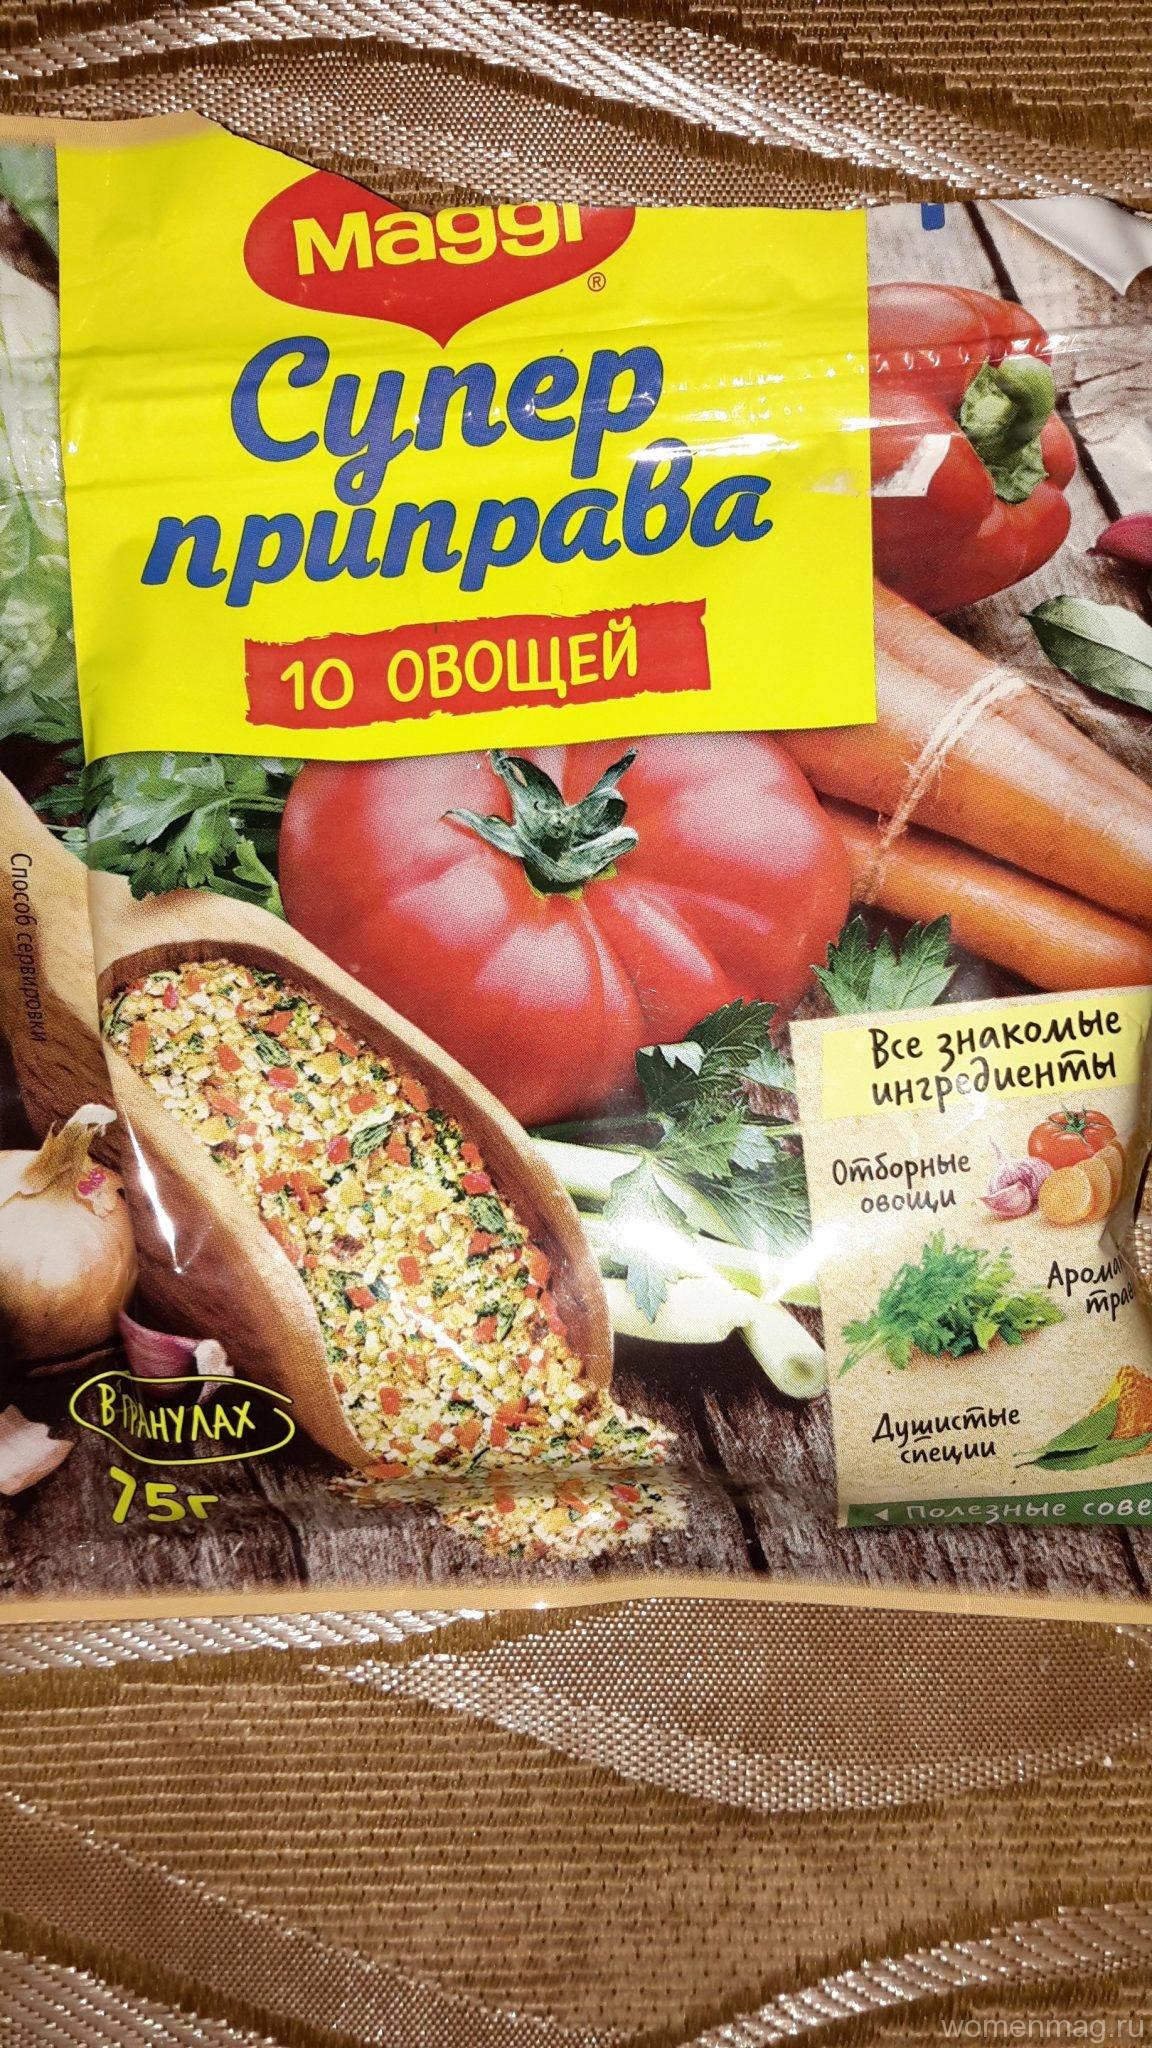 Отзыв на приправу от Магги «Супер приправа 10 овощей»